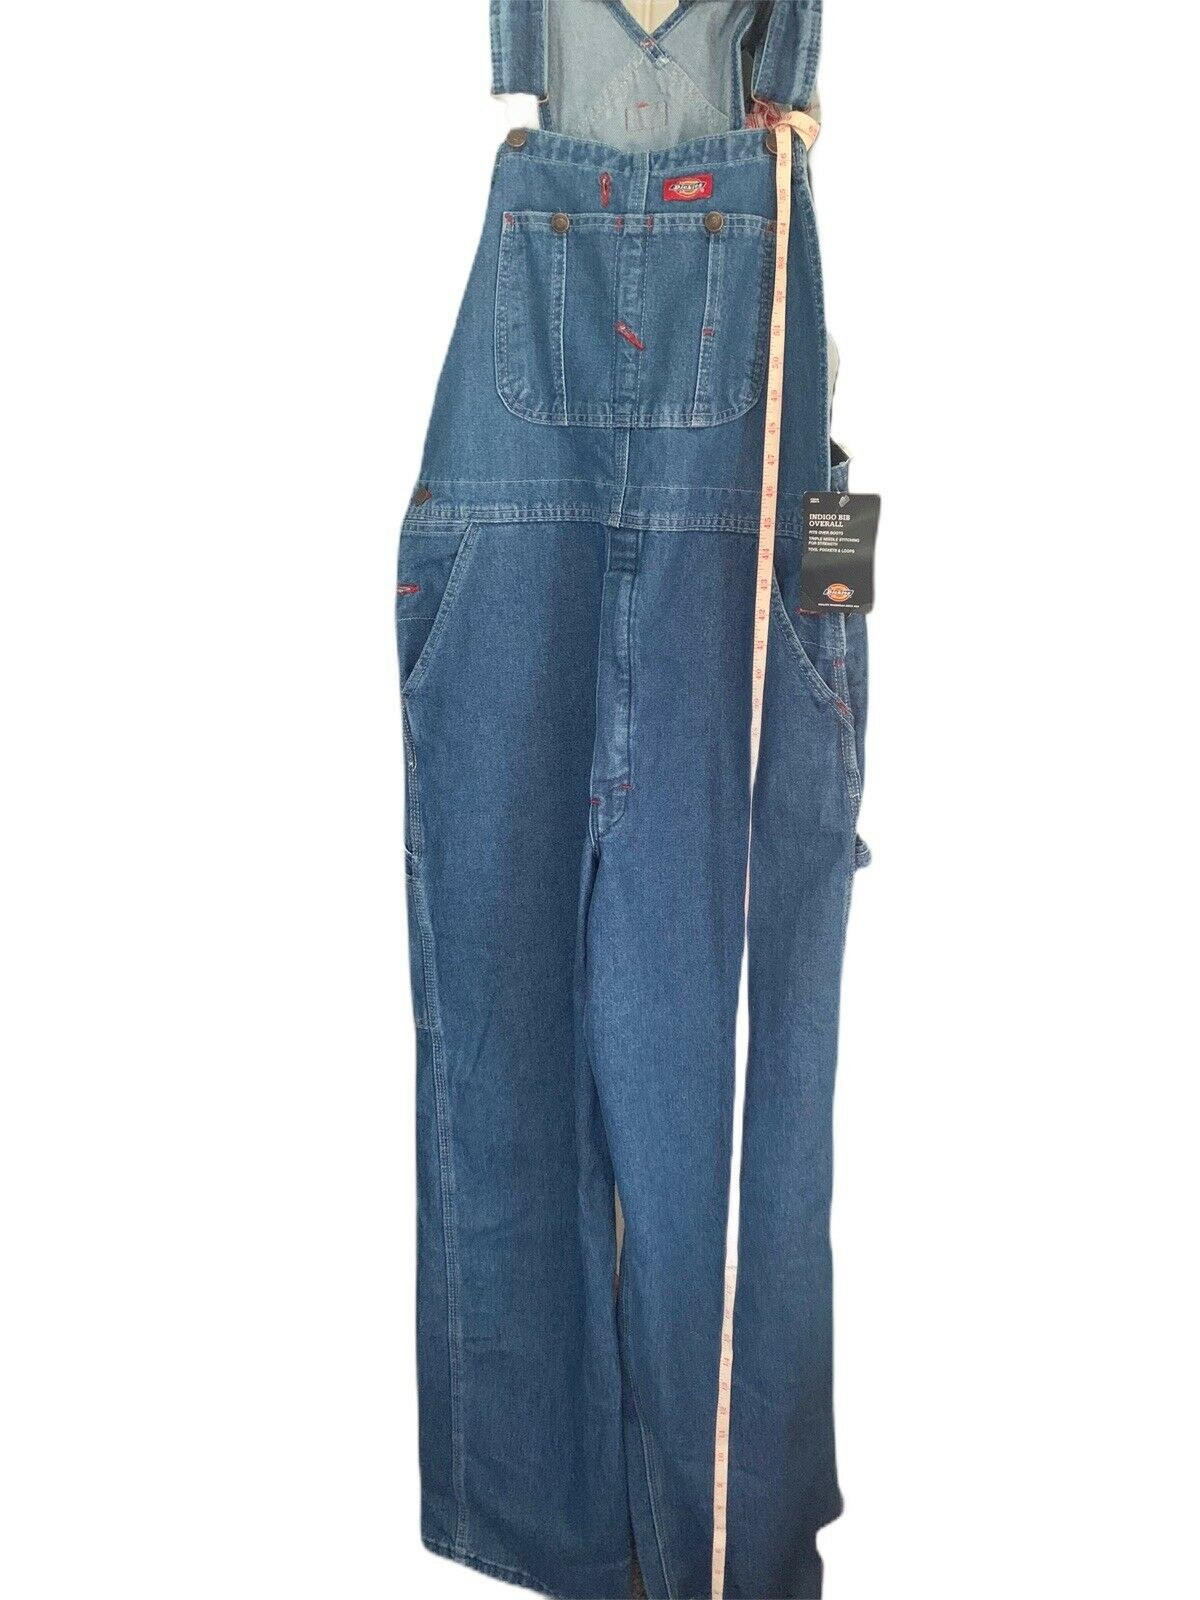 dickies overalls mens - image 3